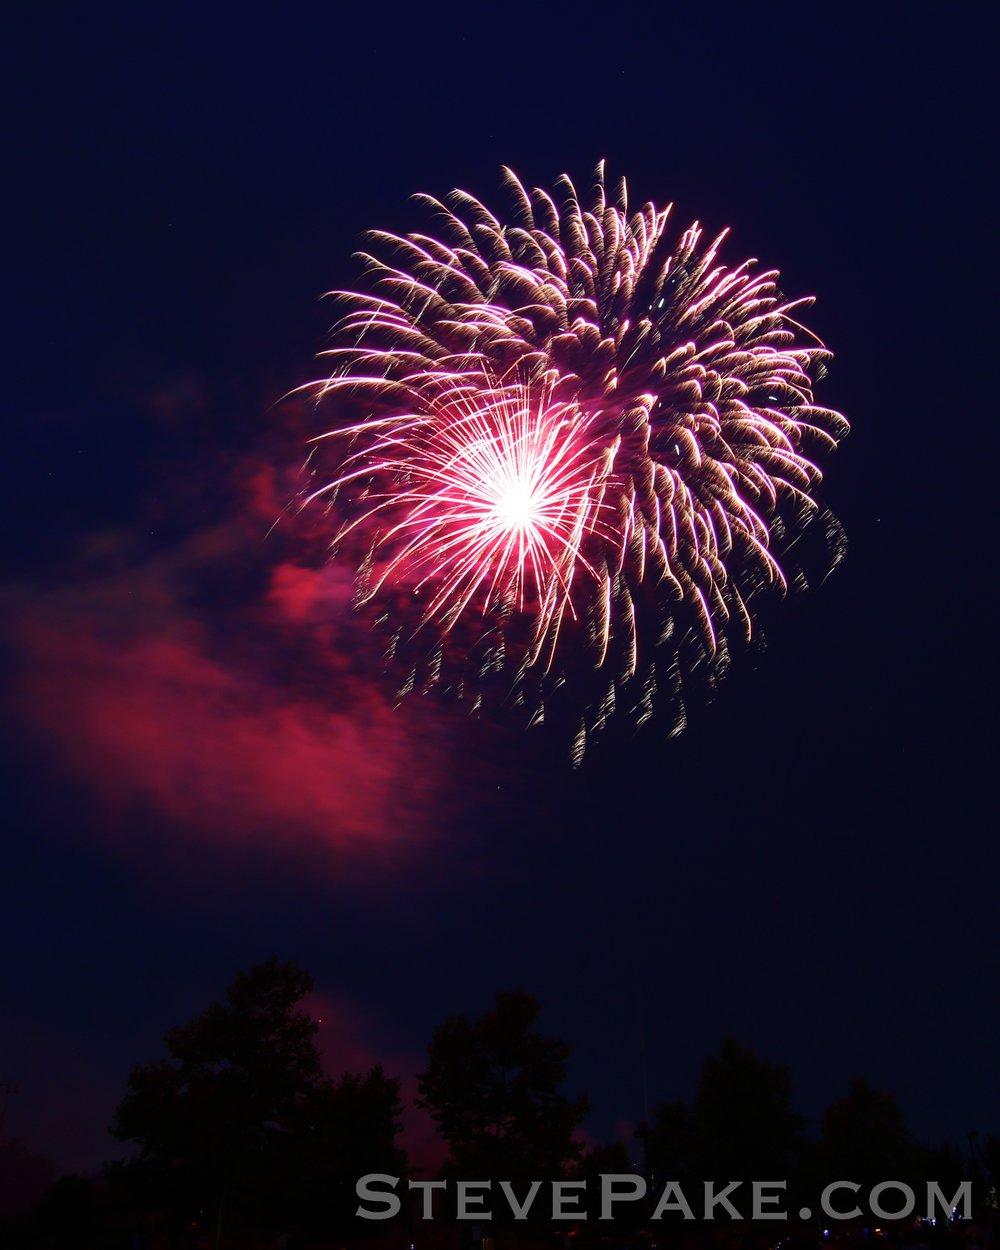 Fireworks2018_29_GE3A8553ap-HD-WM.jpg